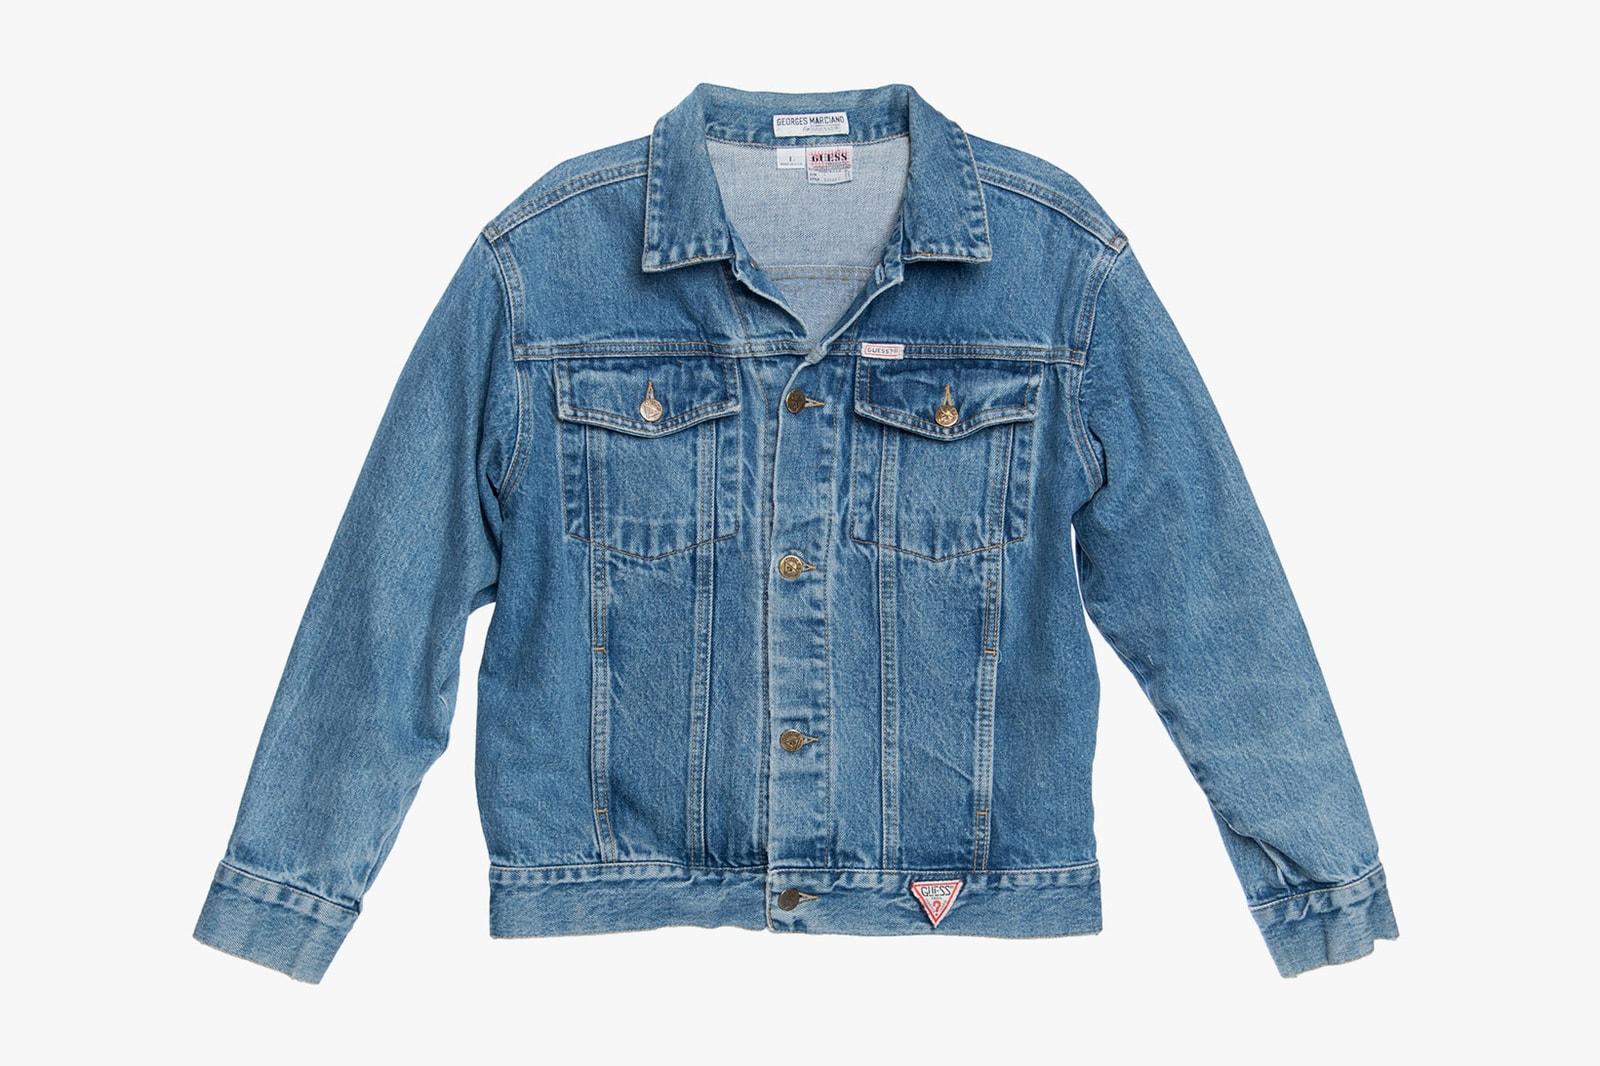 guess vintage jeans denim program 80s 90s triangle logo jackets vests sweaters launch